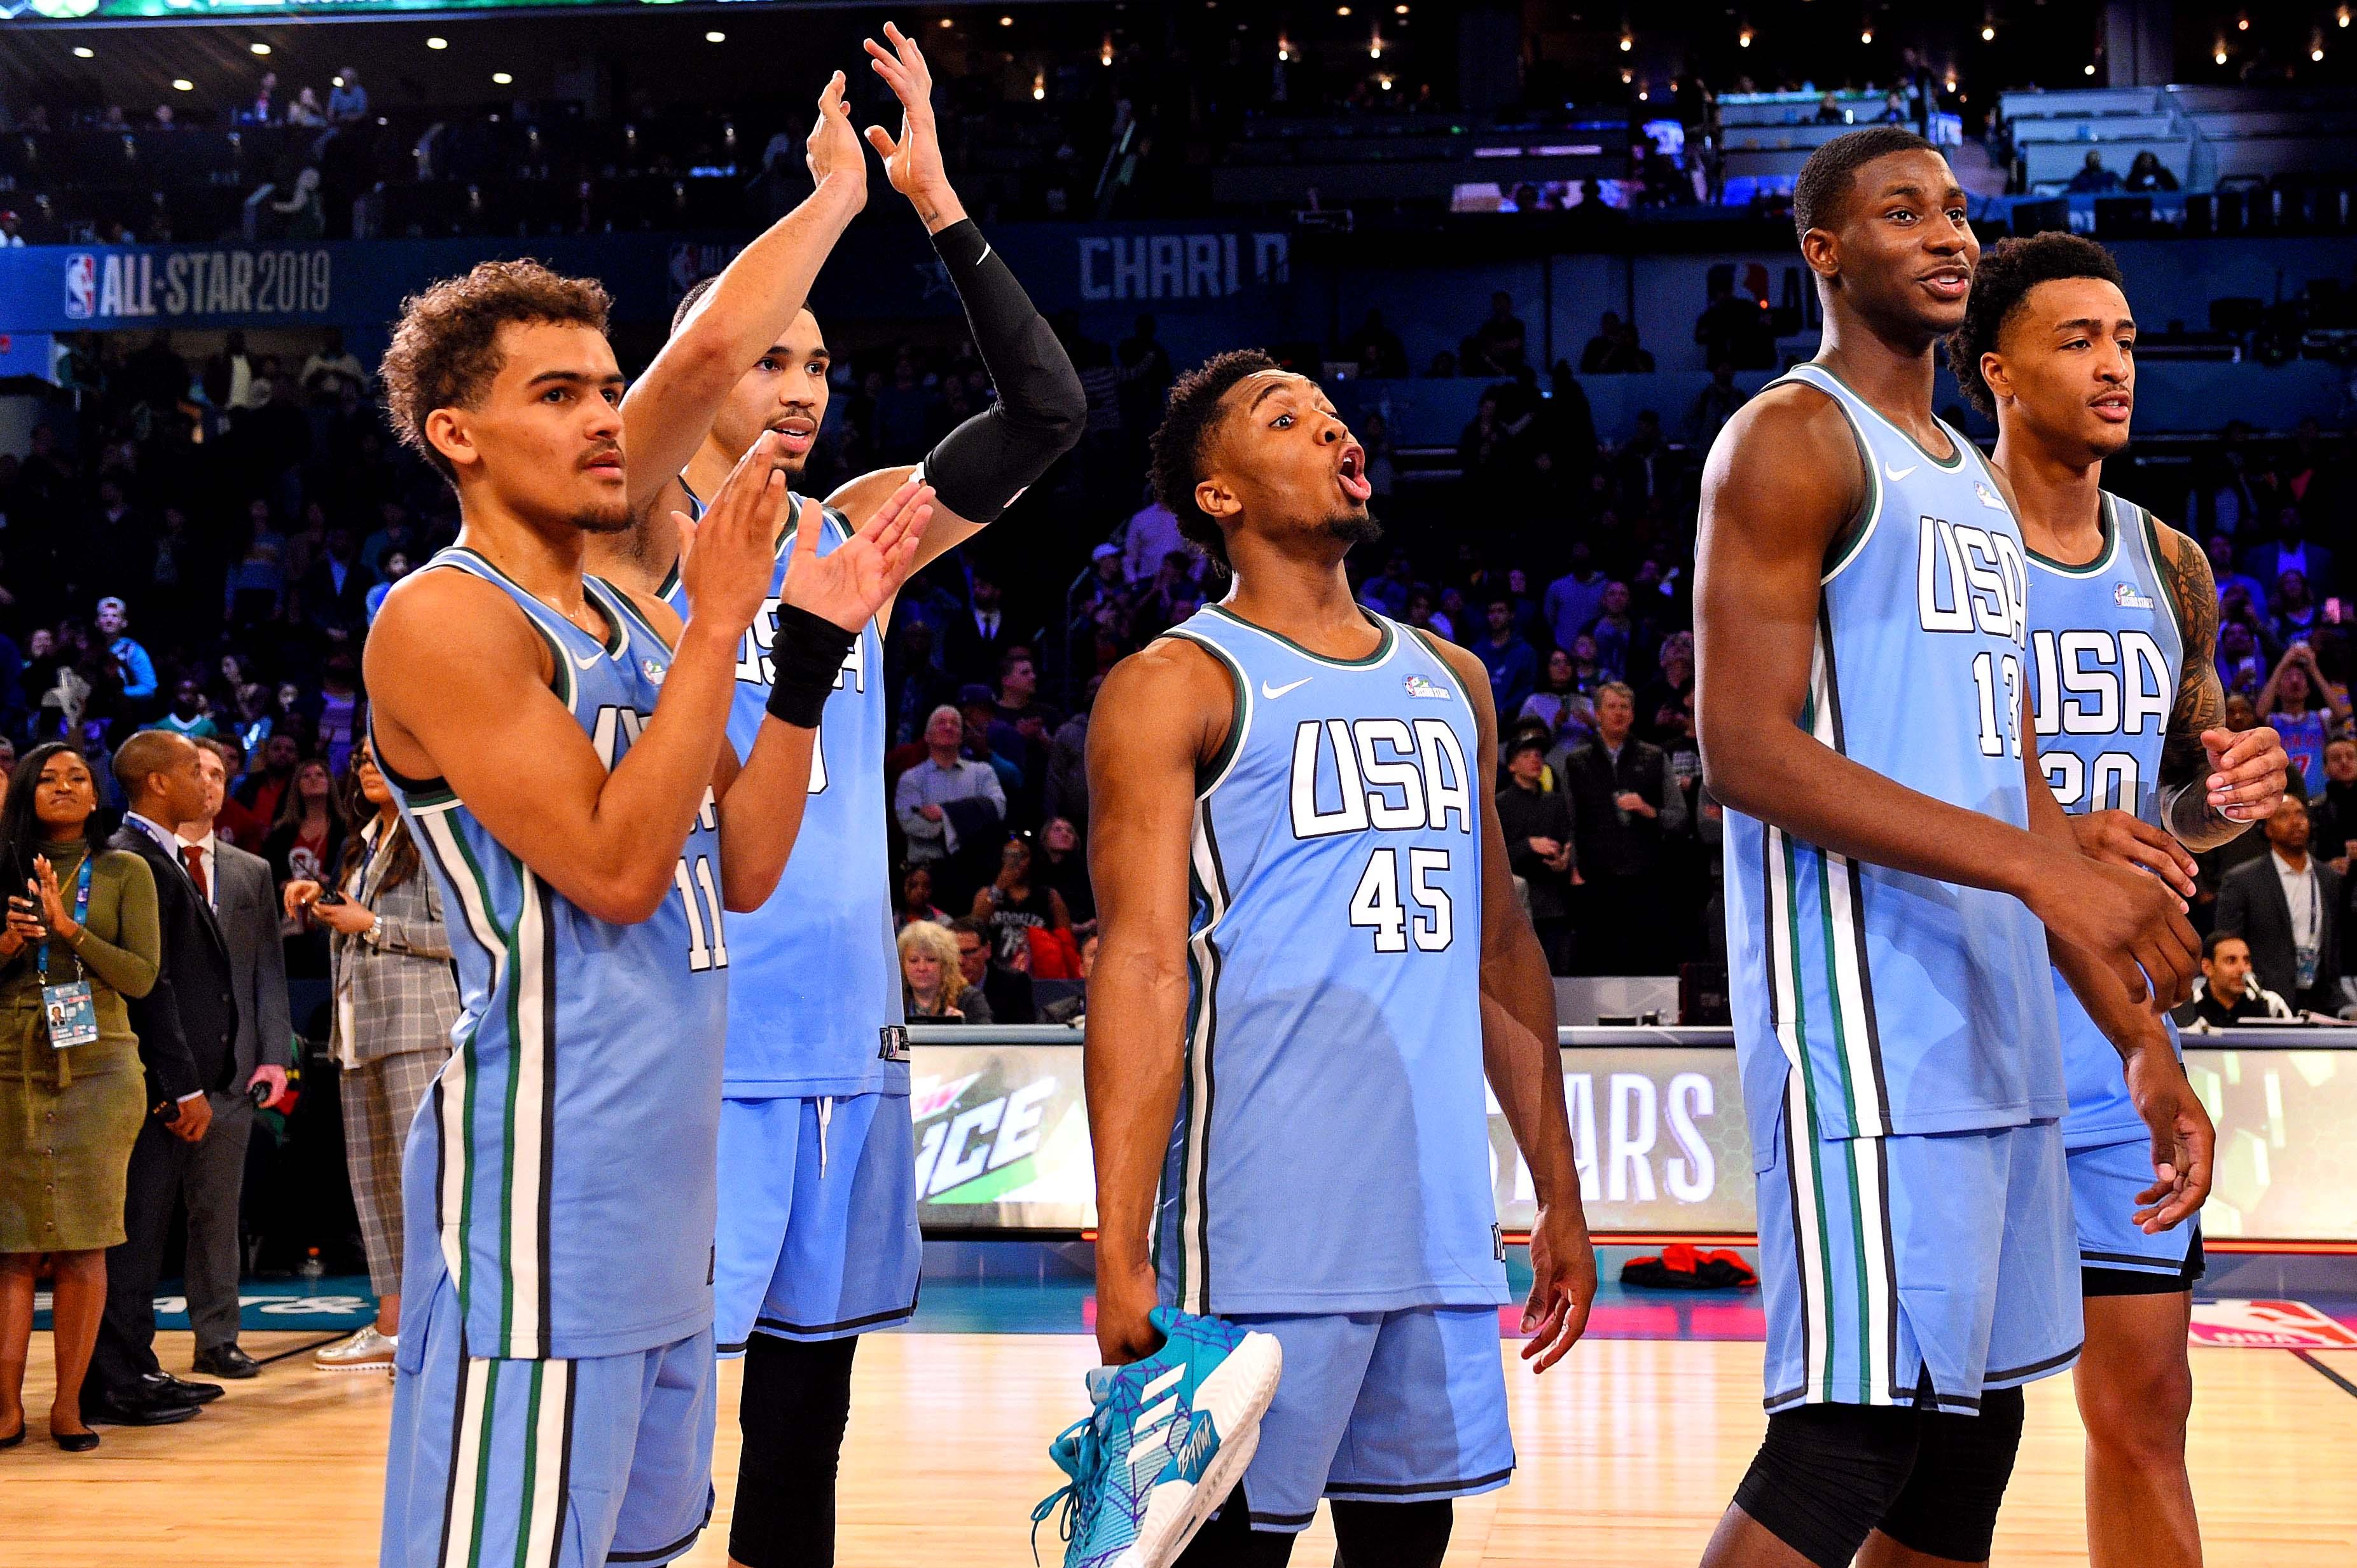 NBA: All Star-Rising Stars